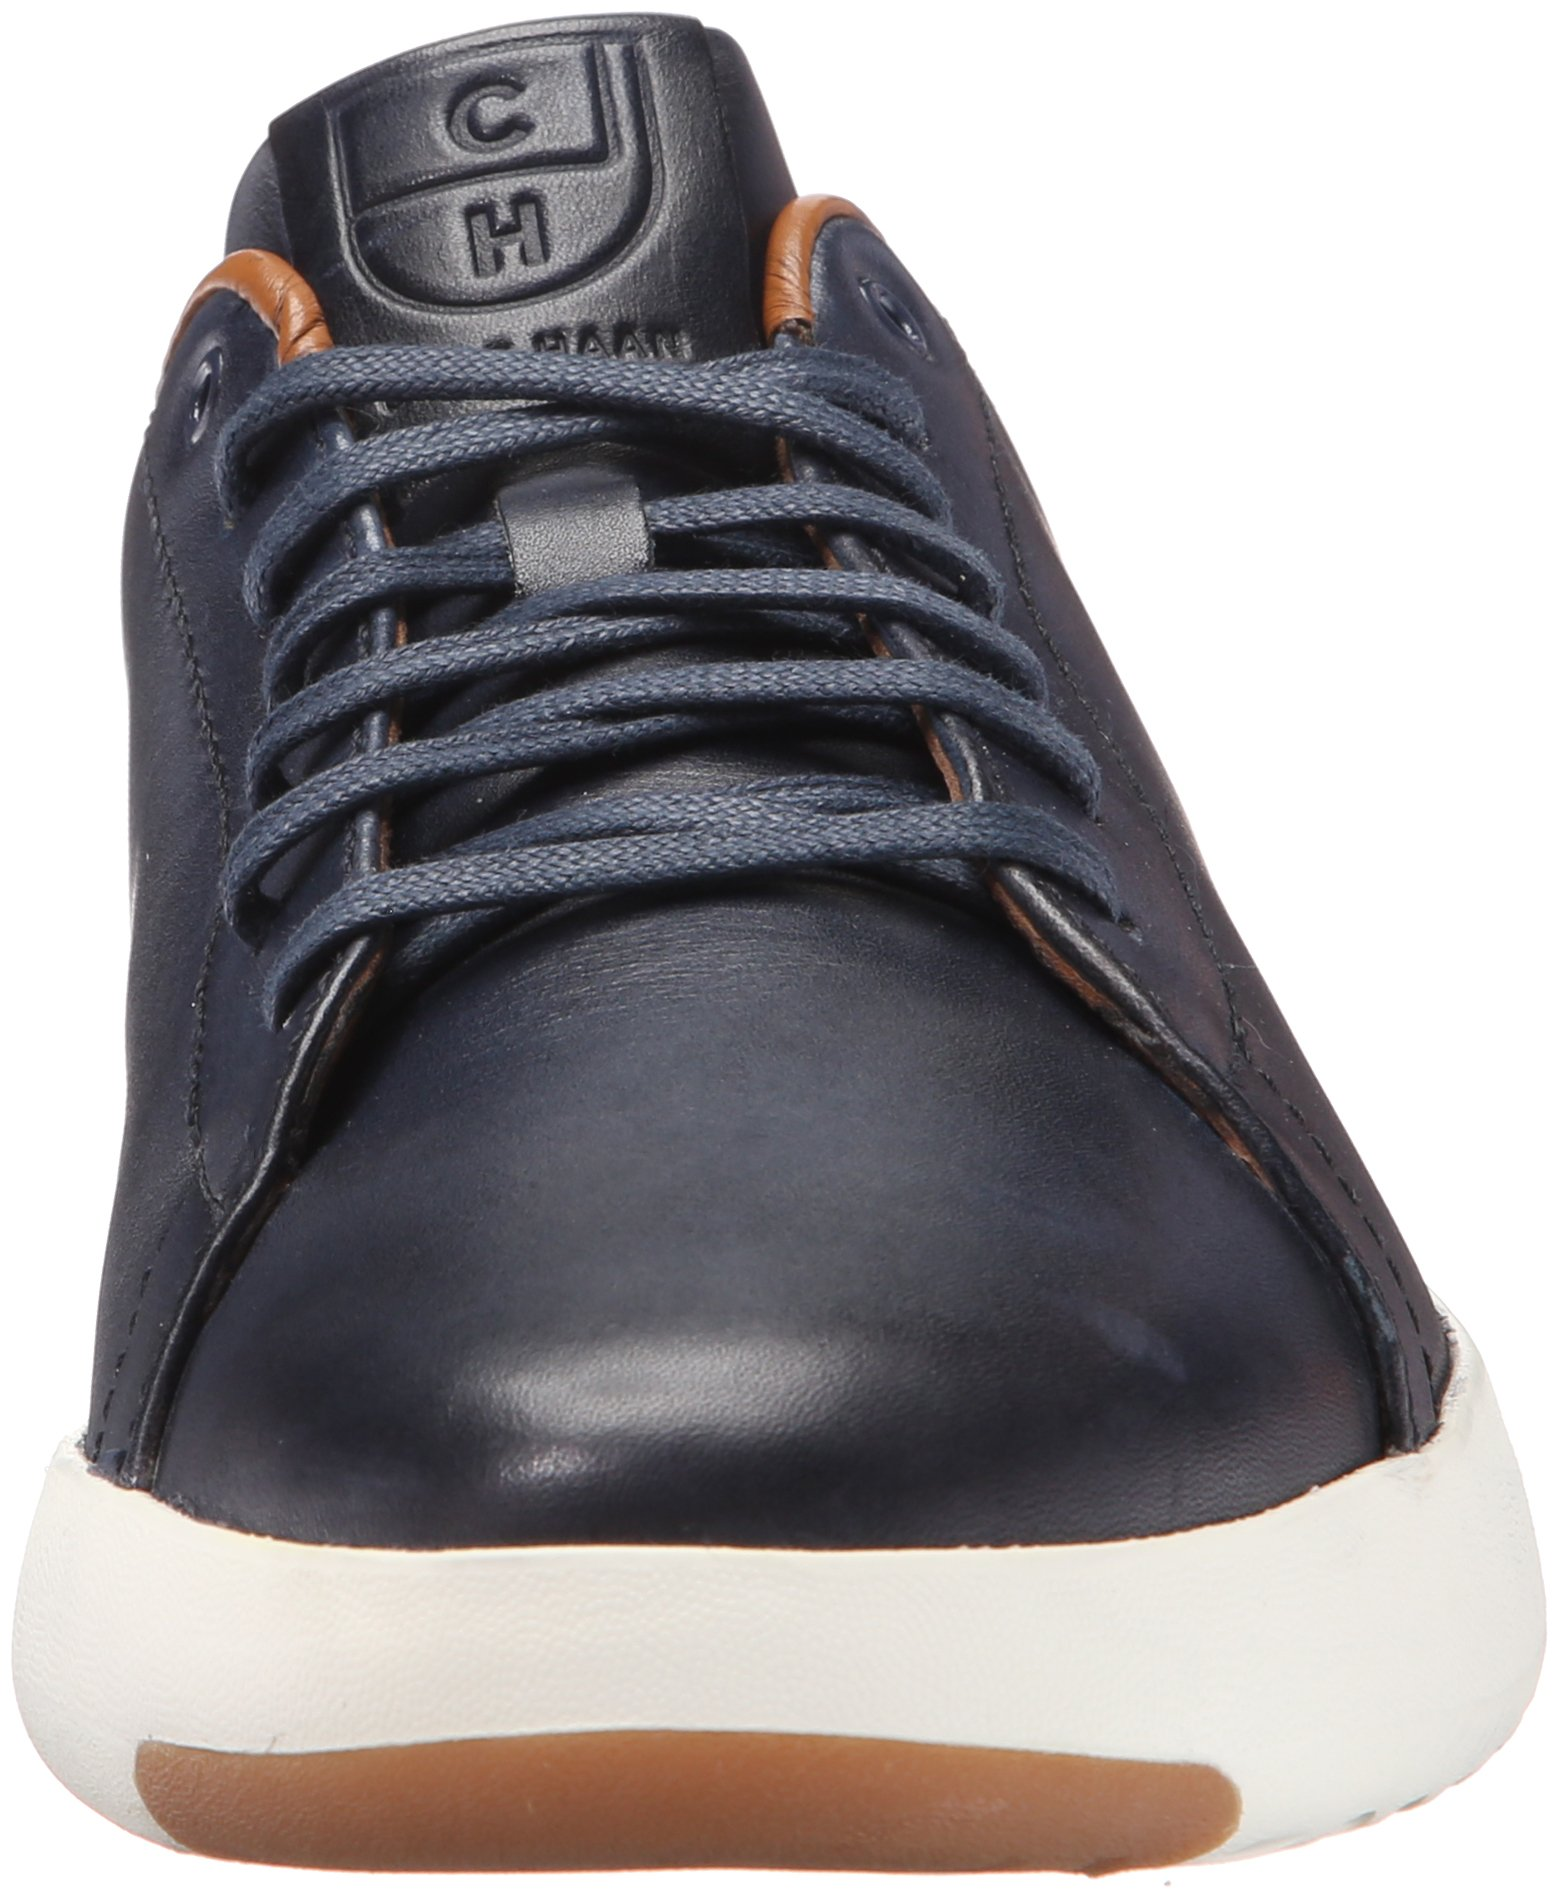 Cole Haan Men's Grandpro Tennis Fashion Sneaker, Blazer Blue Hand Stain, 7 M US by Cole Haan (Image #4)